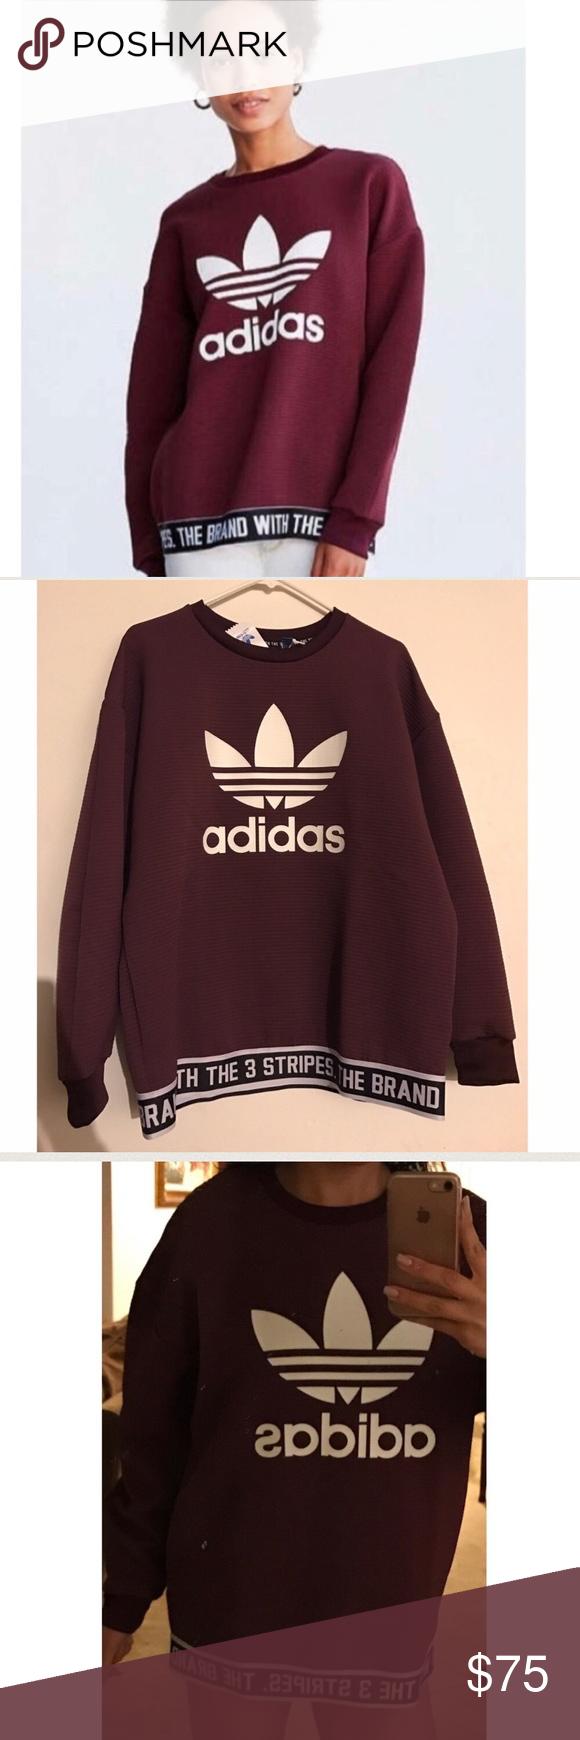 736554f2b Nwt Adidas women s oversize Sweater top Medium This is a new Adidas women s  oversize Sweater. Size Medium. Color burgundy . Has the large Adidas logo  on ...